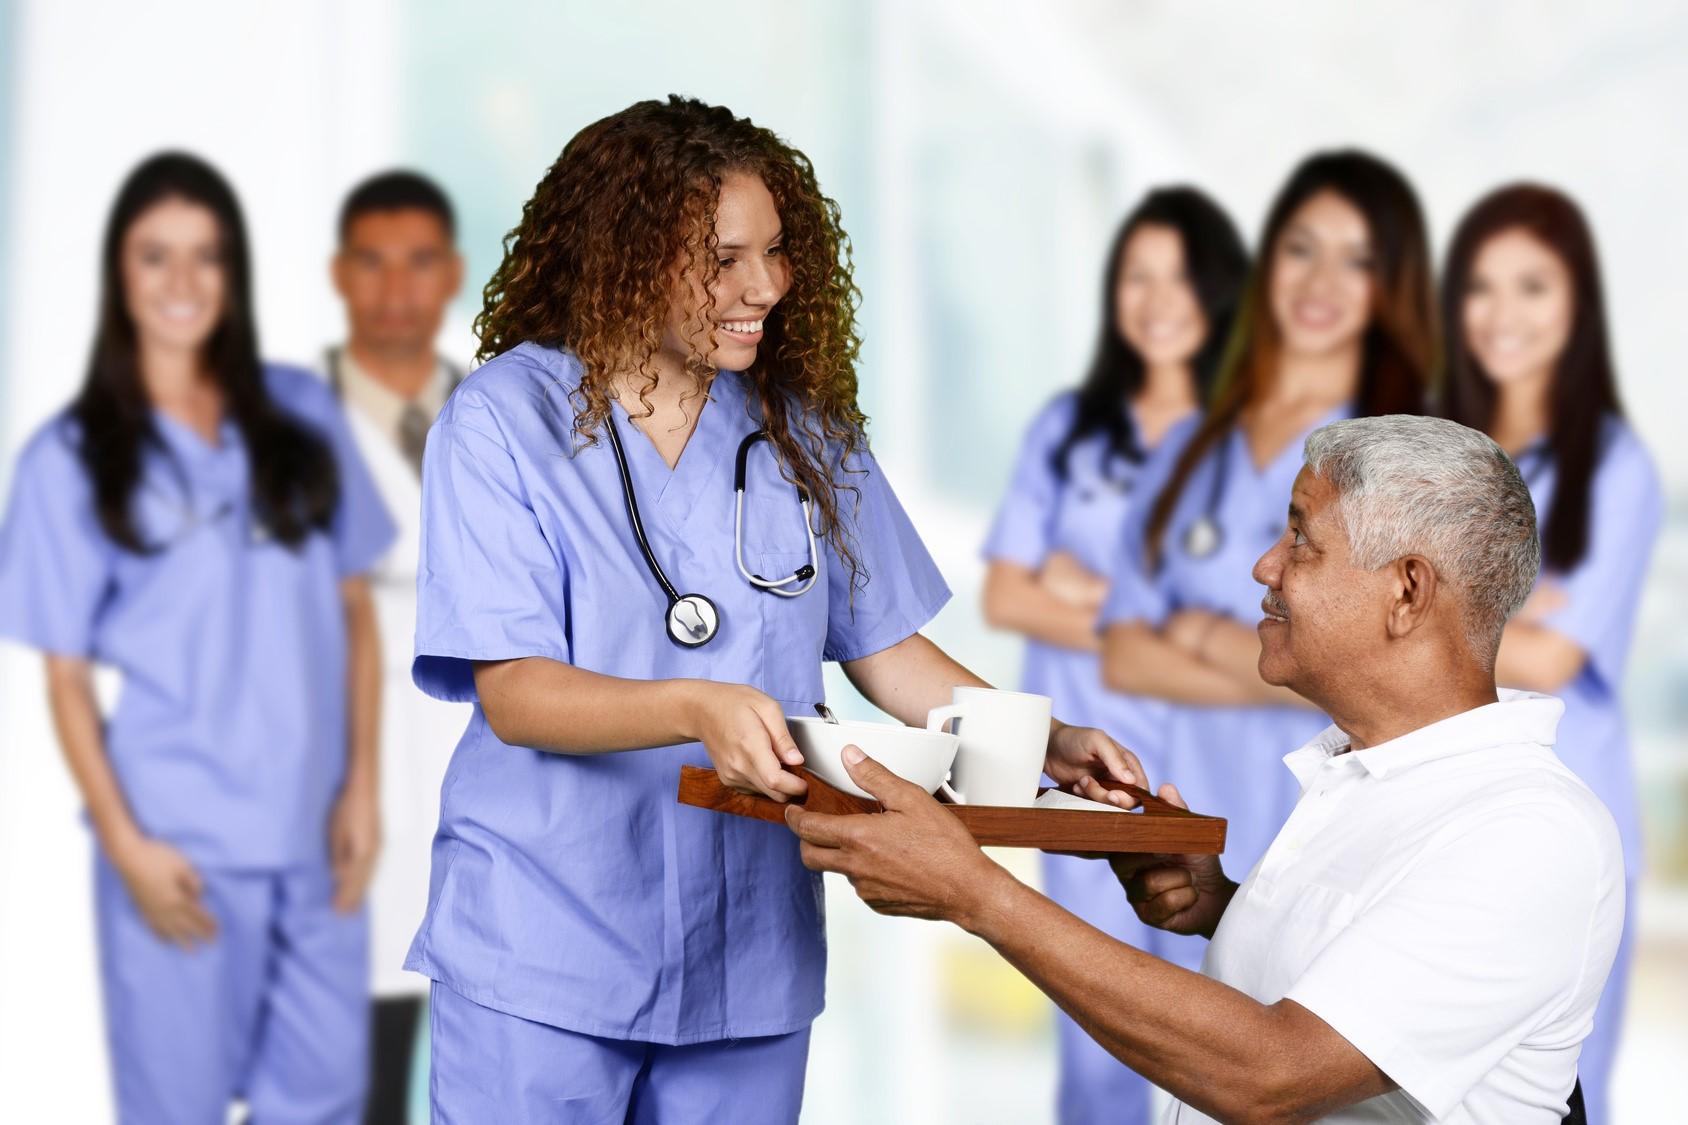 concours entree institut de formation aide soignant